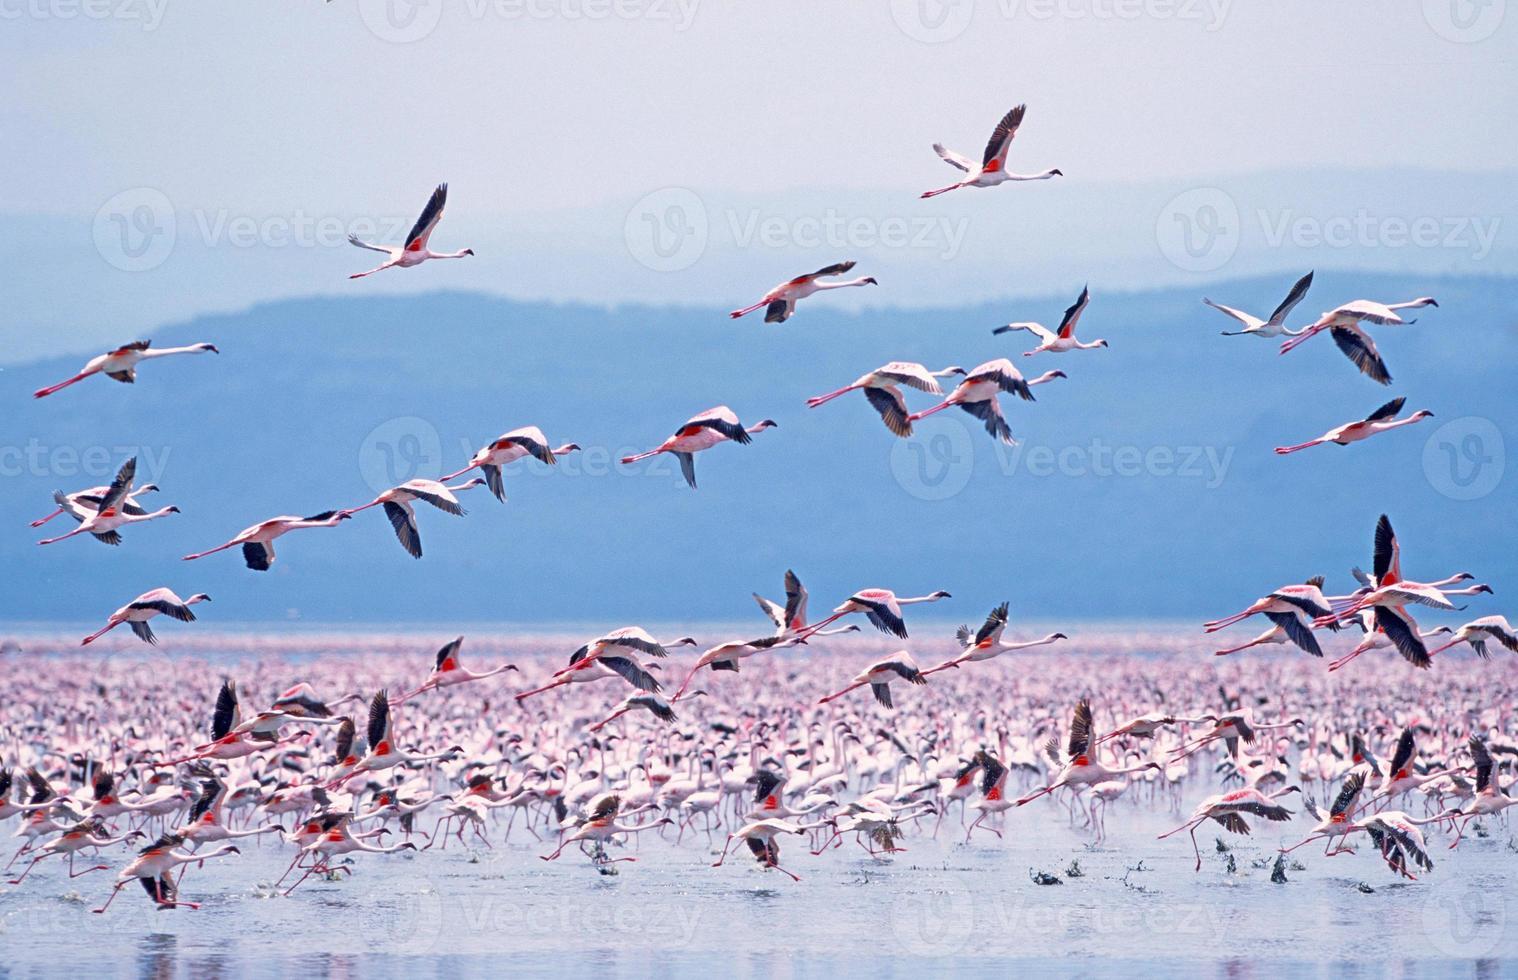 kleiner Flamingo (Phoenixiconas minor) foto